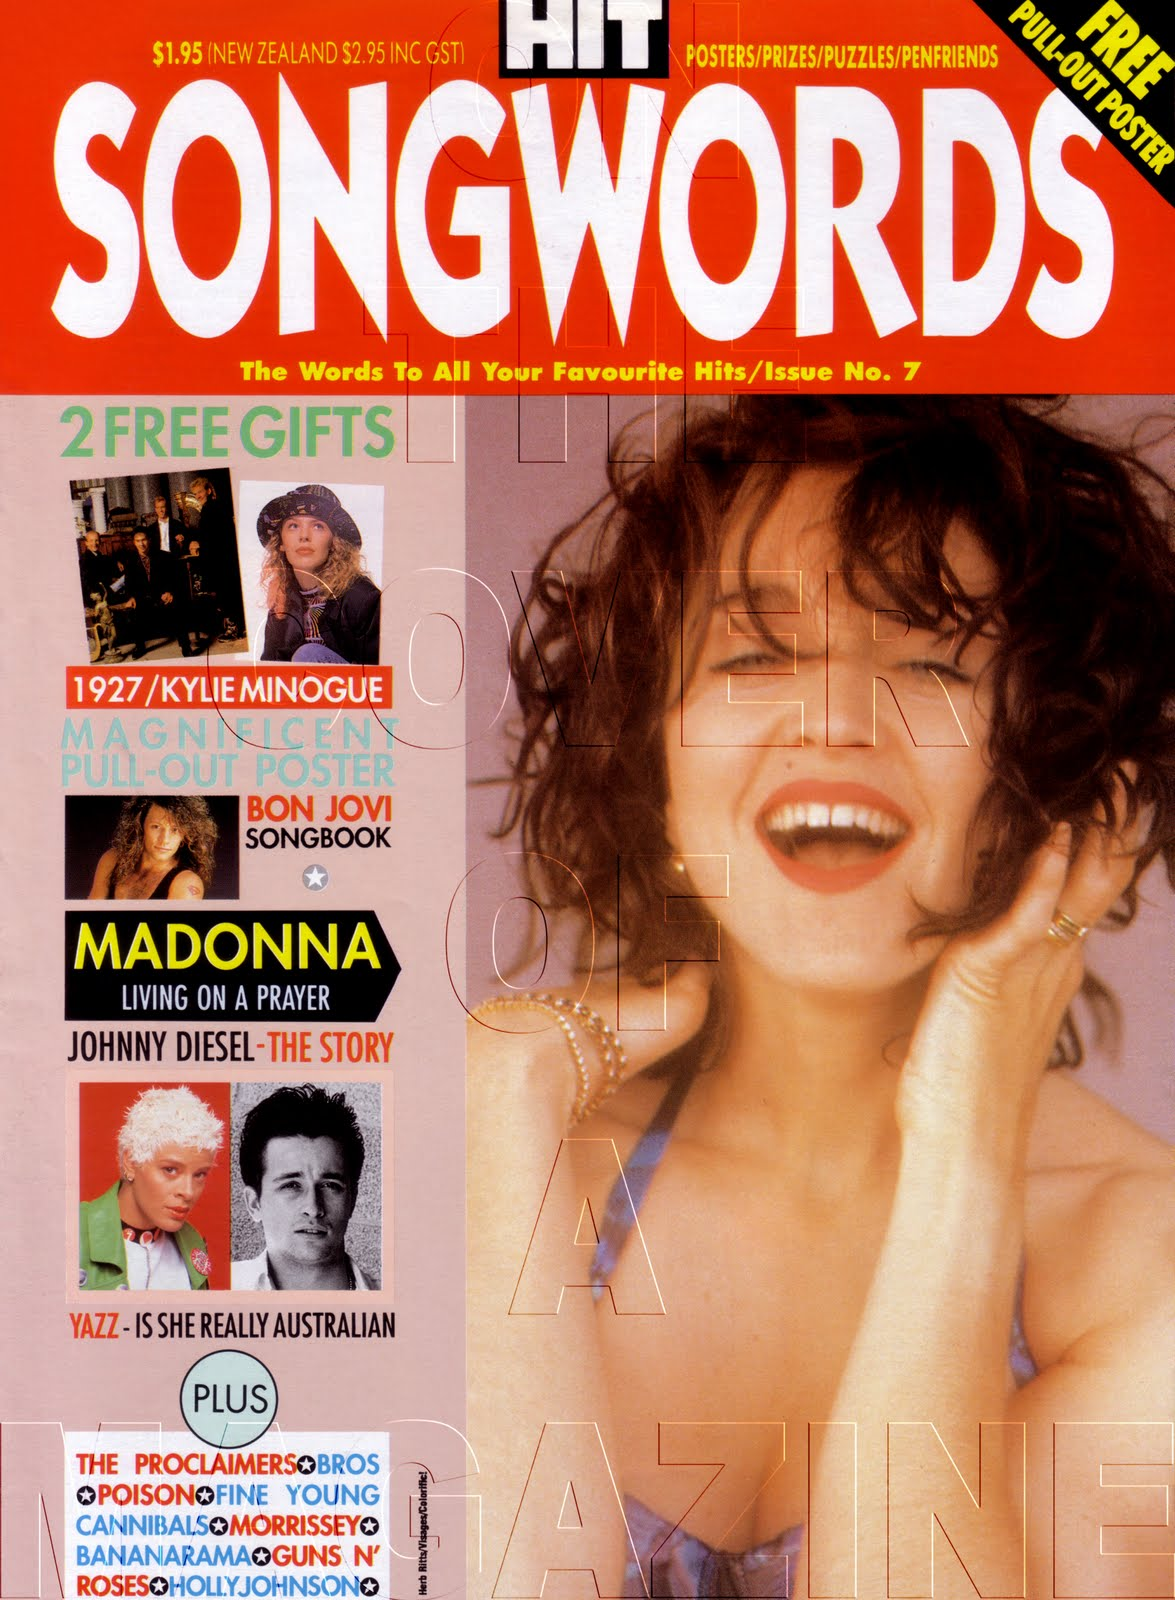 http://4.bp.blogspot.com/_eA7ZafYKvfU/TAiQ1pBTiXI/AAAAAAAADNM/_9V-_E1aL3o/s1600/Hit+Songwords+Australia+1989+Herb+Ritts+copy.jpg